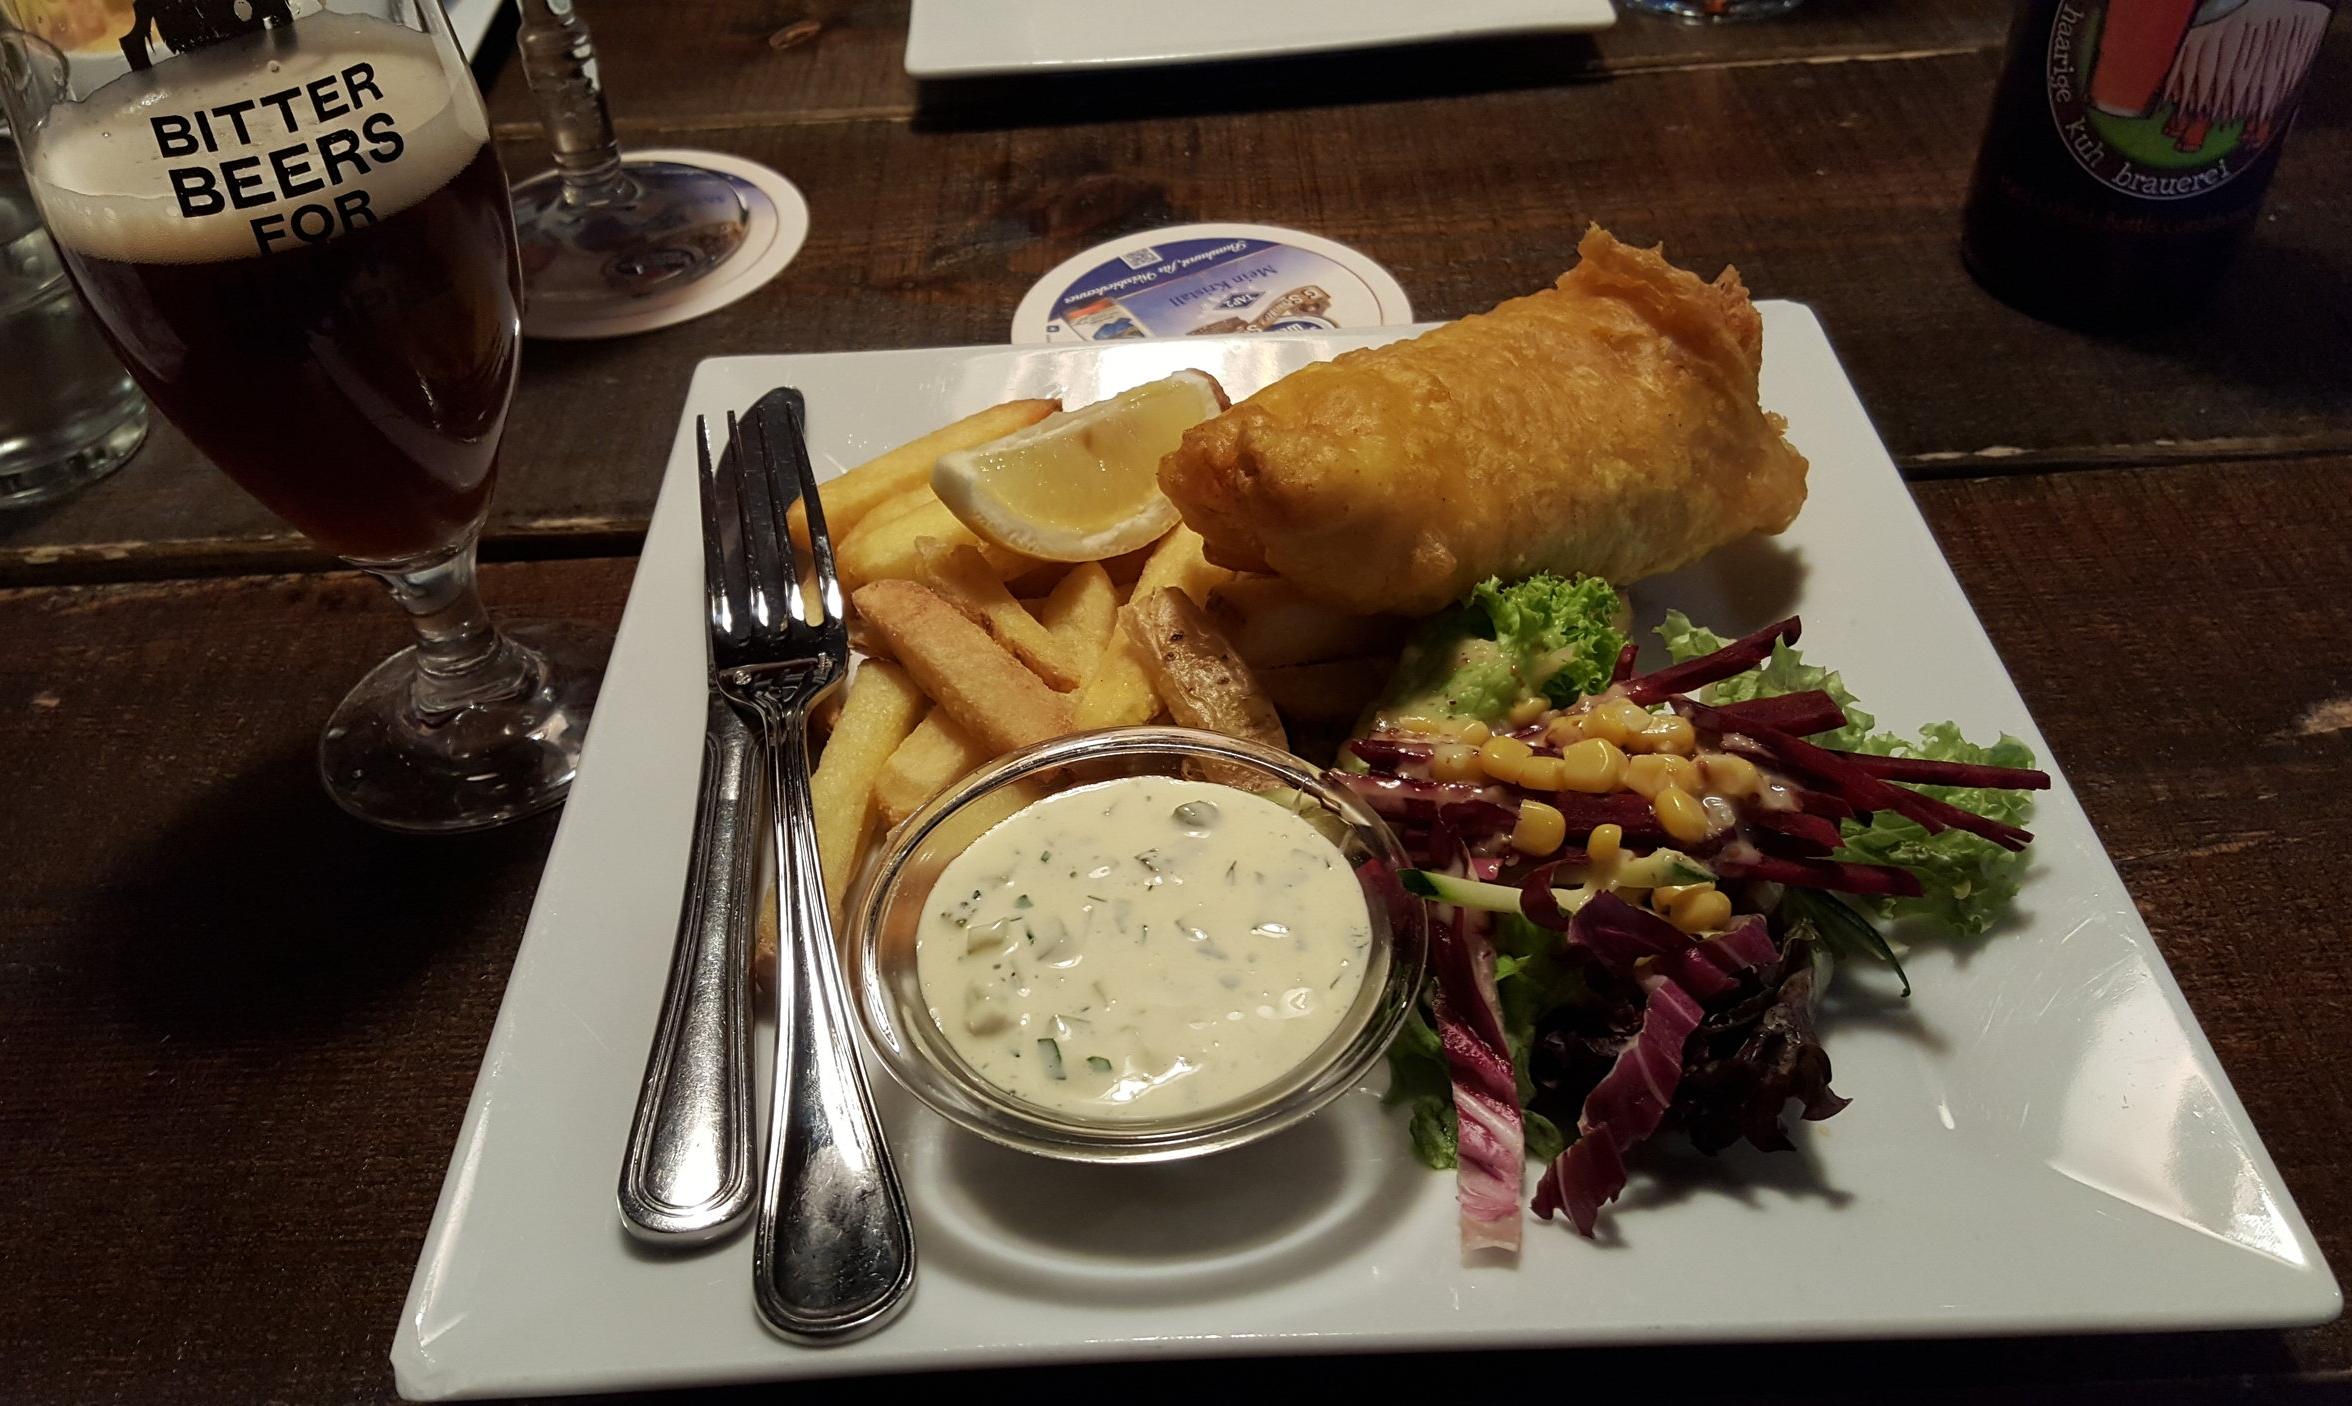 Beer and fish & chips from Husi Bierhaus (Interlaken, Switzerland)